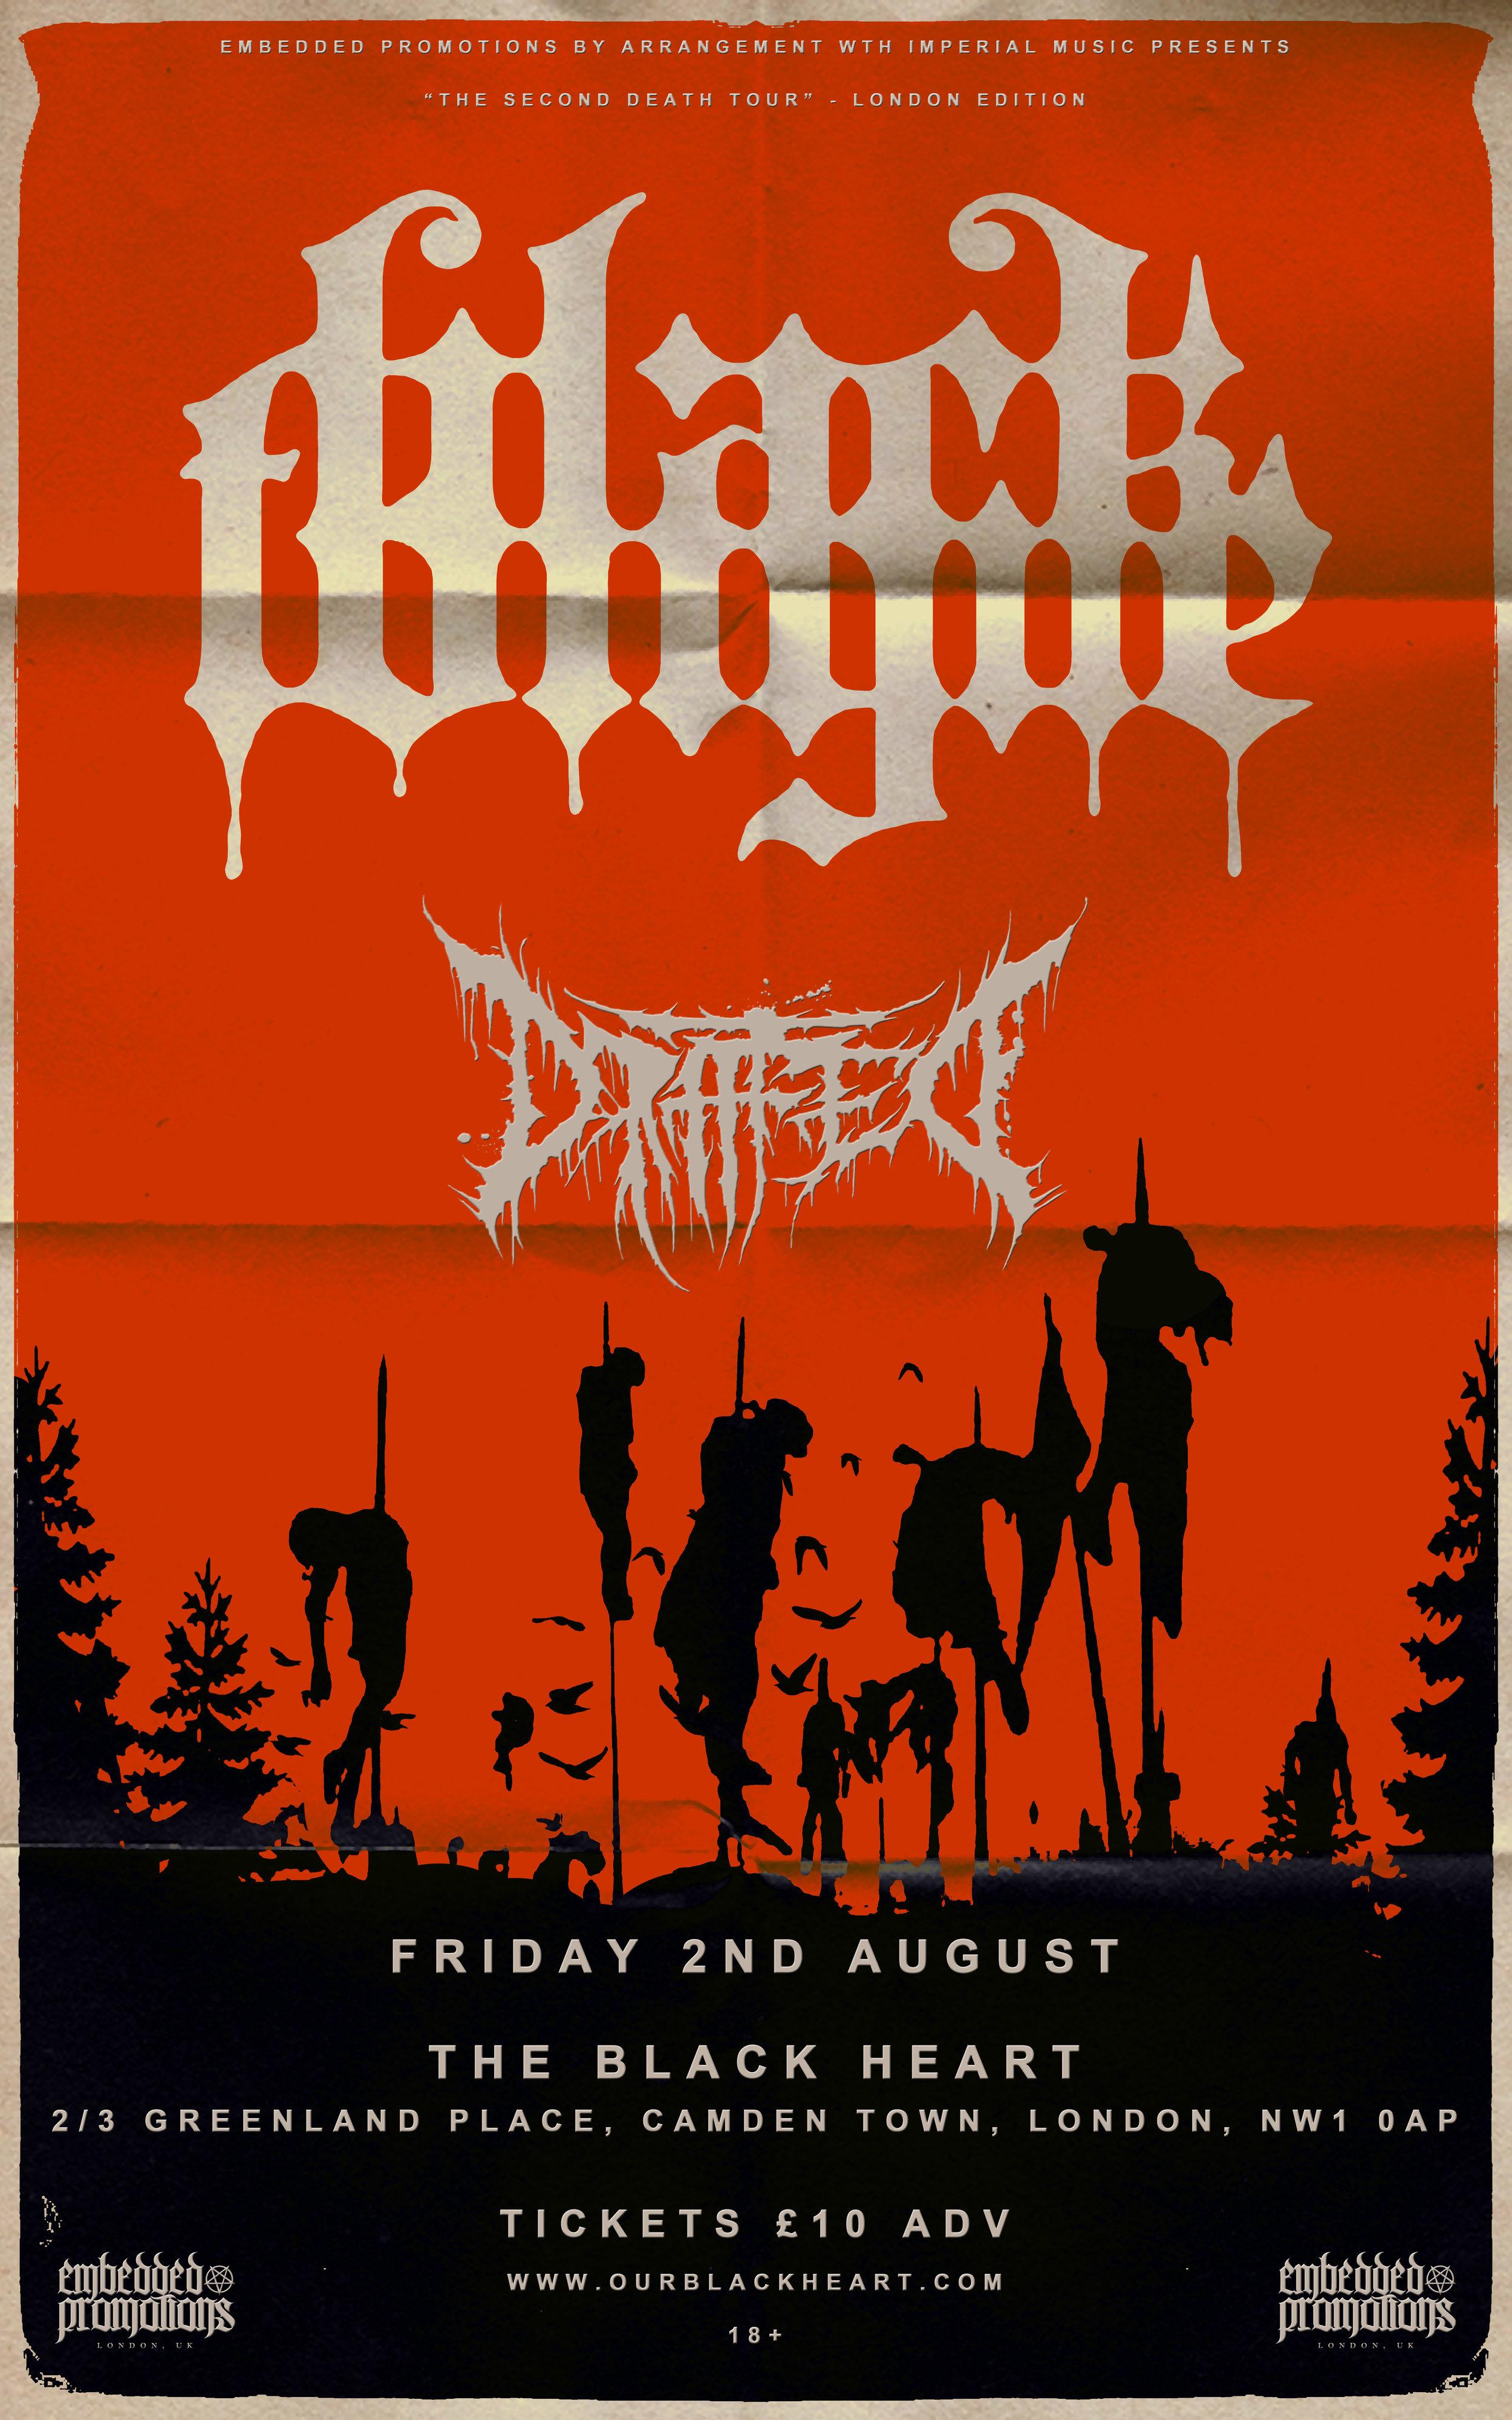 SECOND DEATH TOUR Flyer.jpg